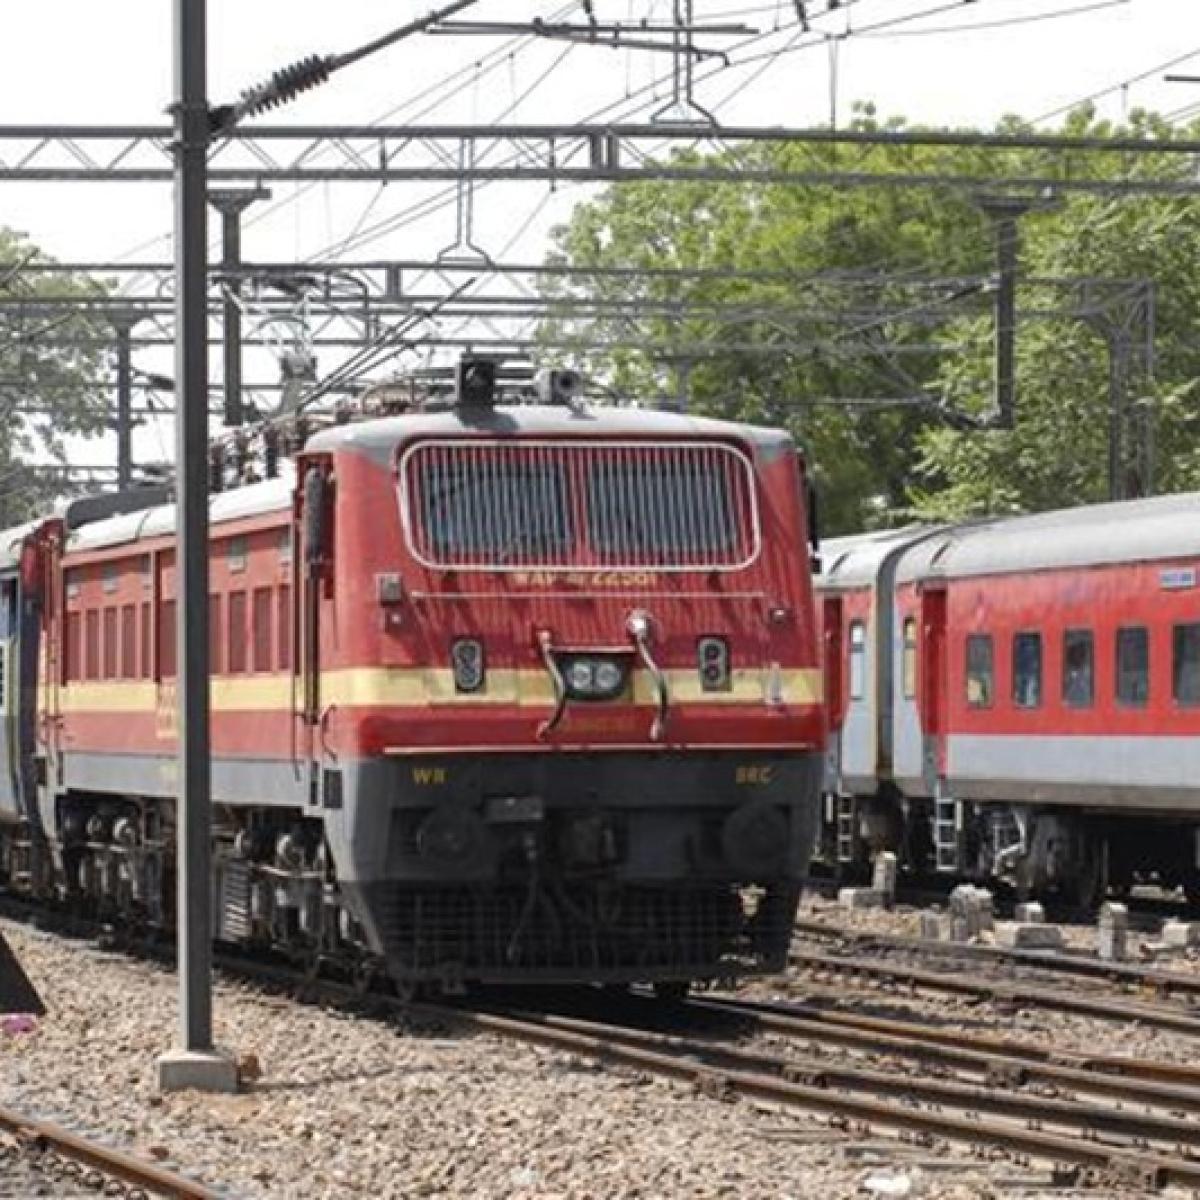 Goods train derails near Karjat-Lonavla section: Railways official